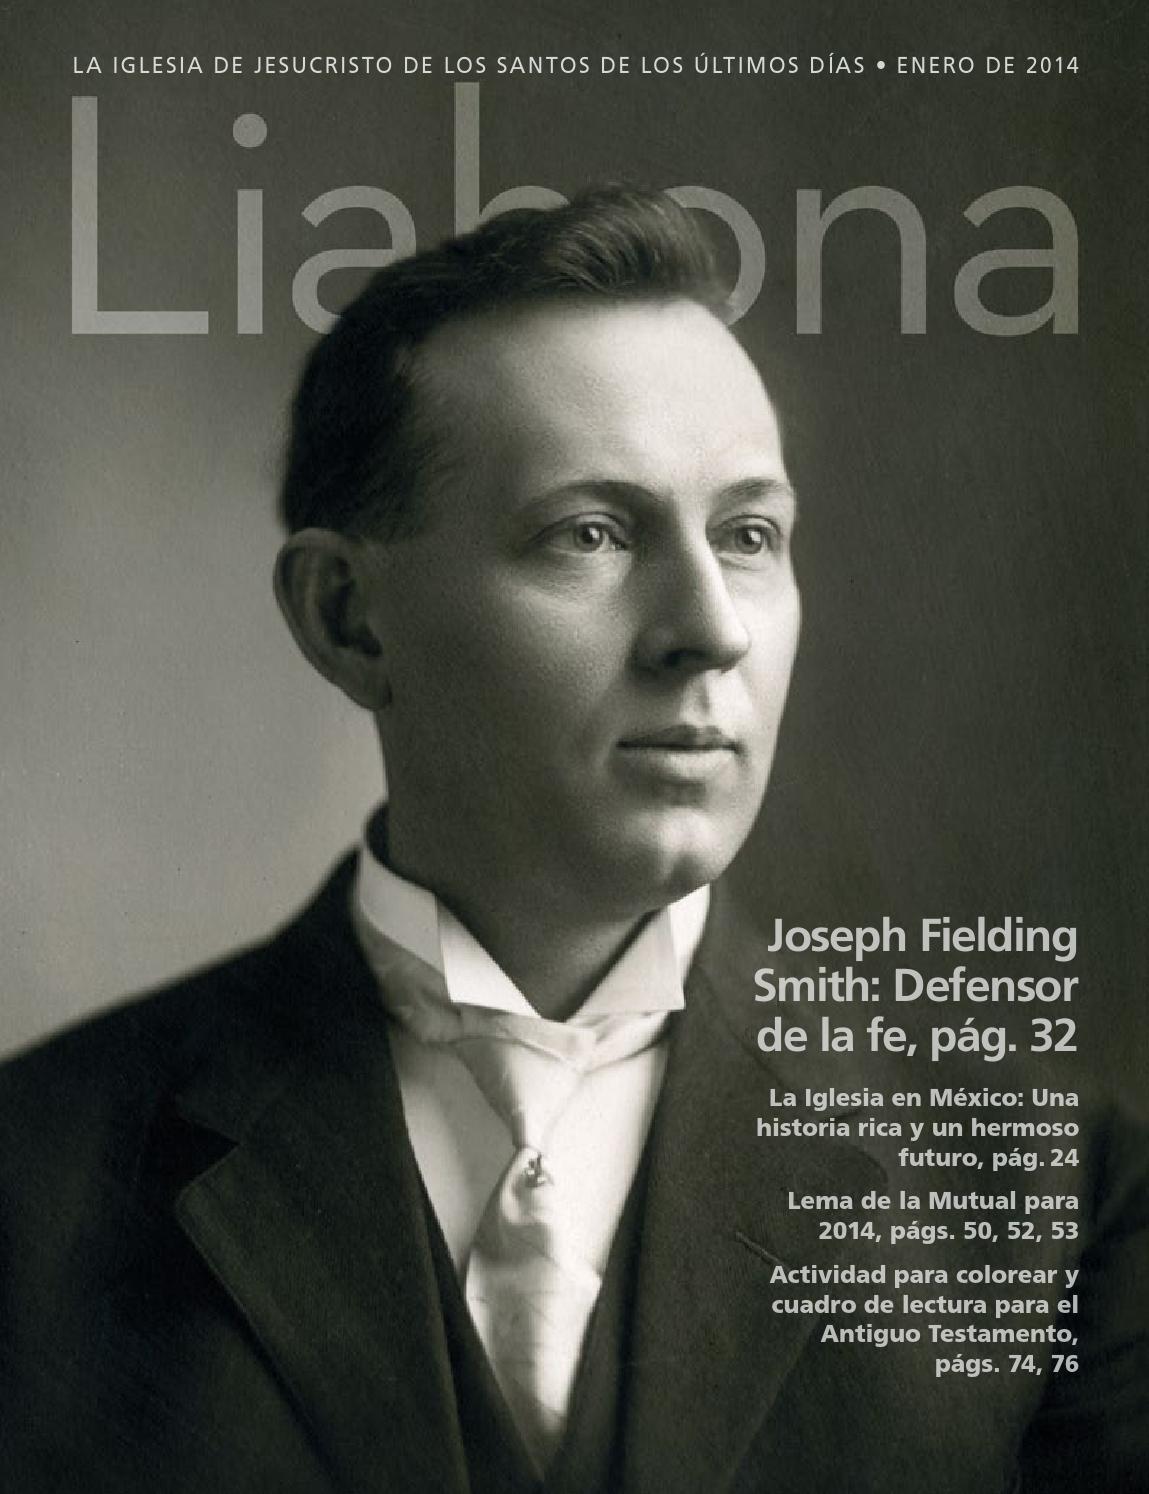 Liahona Enero 2014 by Luis A. Duarte - issuu